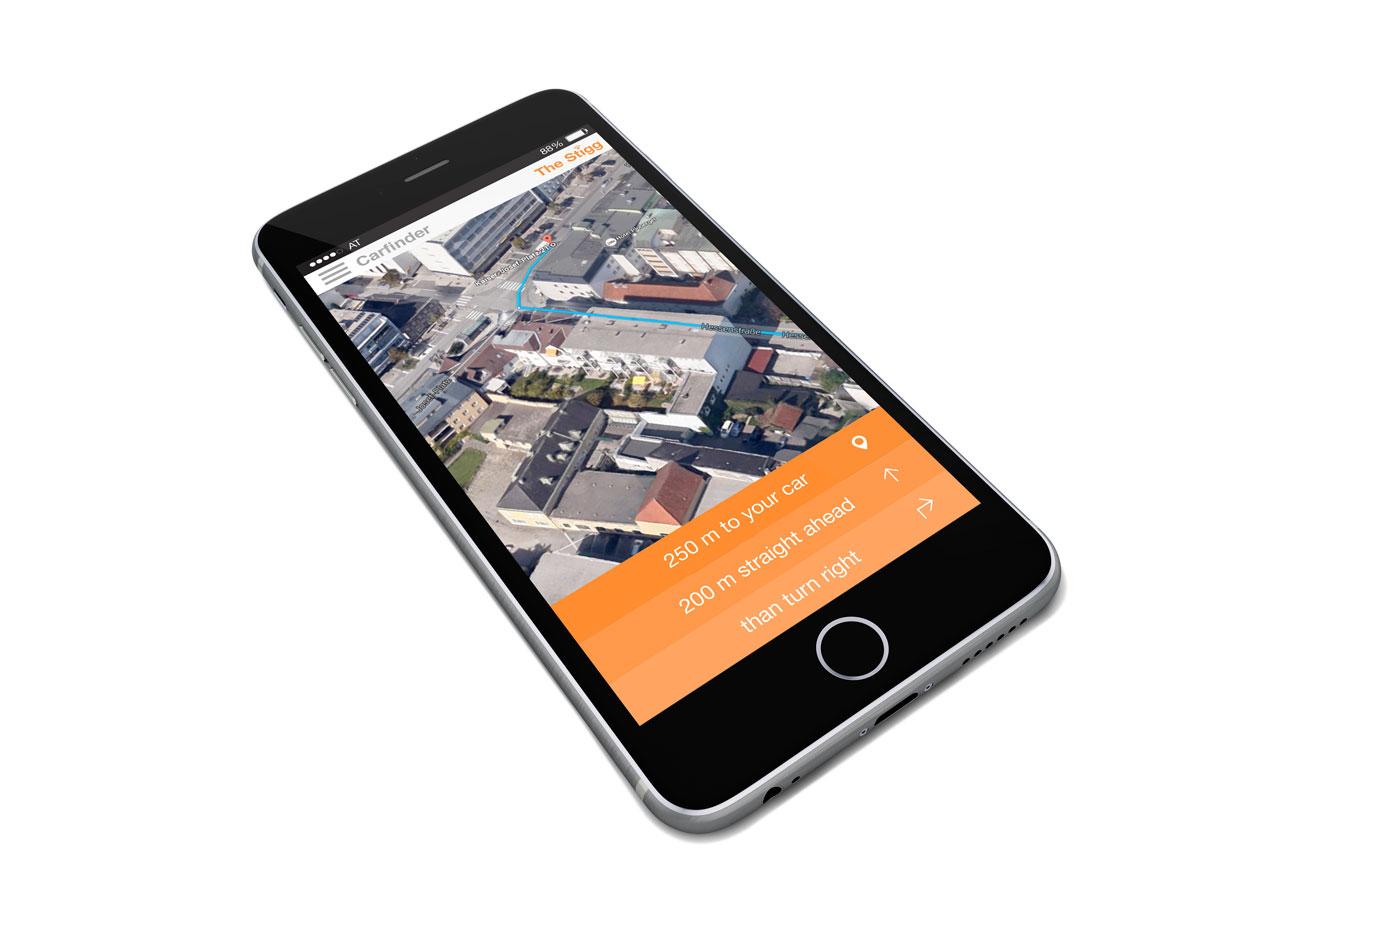 smarte-apps-8_the-stigg_designkitchen.jpg